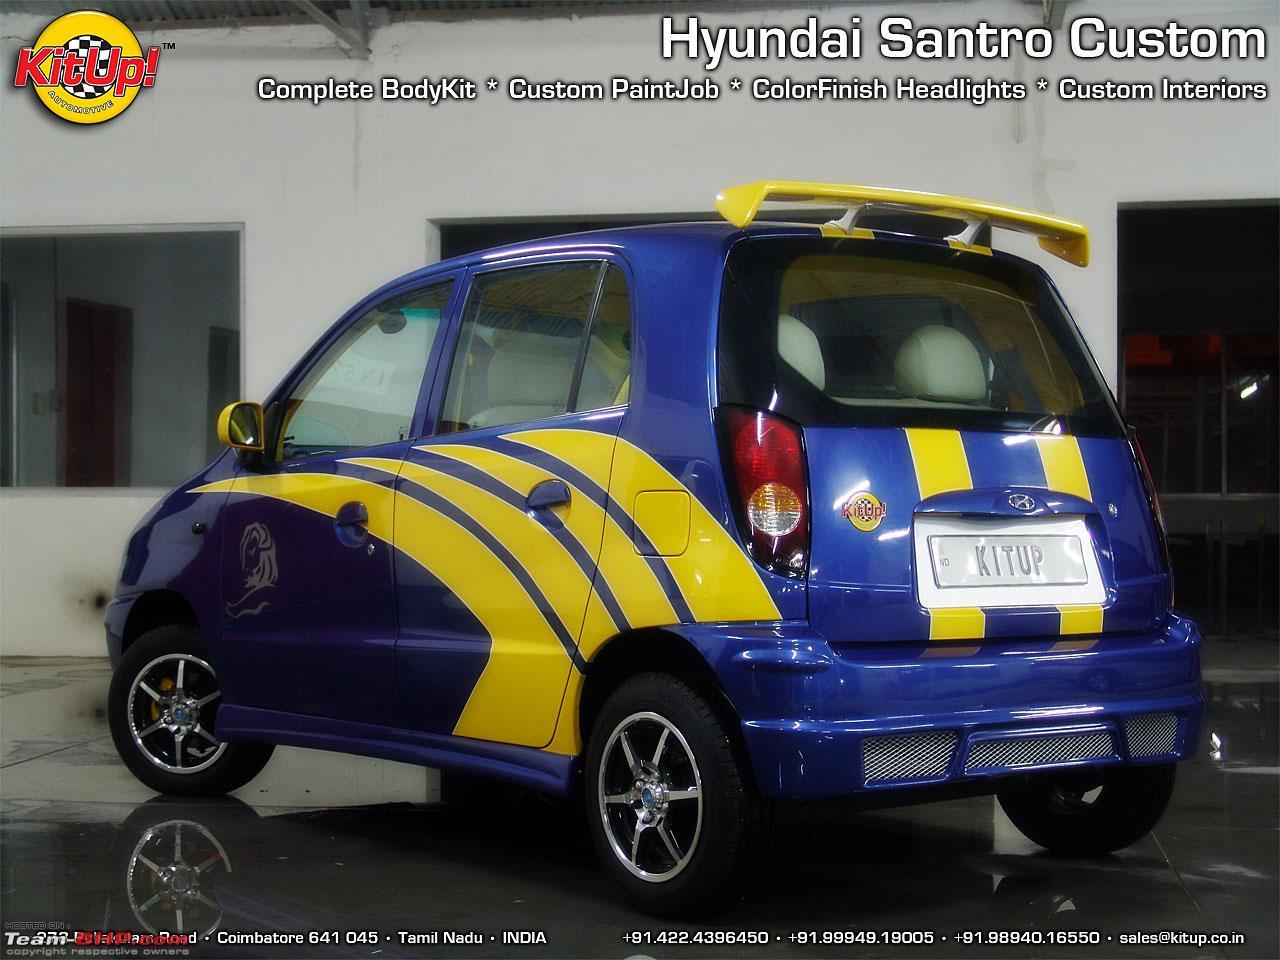 Hyundai Santro Zip Drive 2002 Model Restoration Project